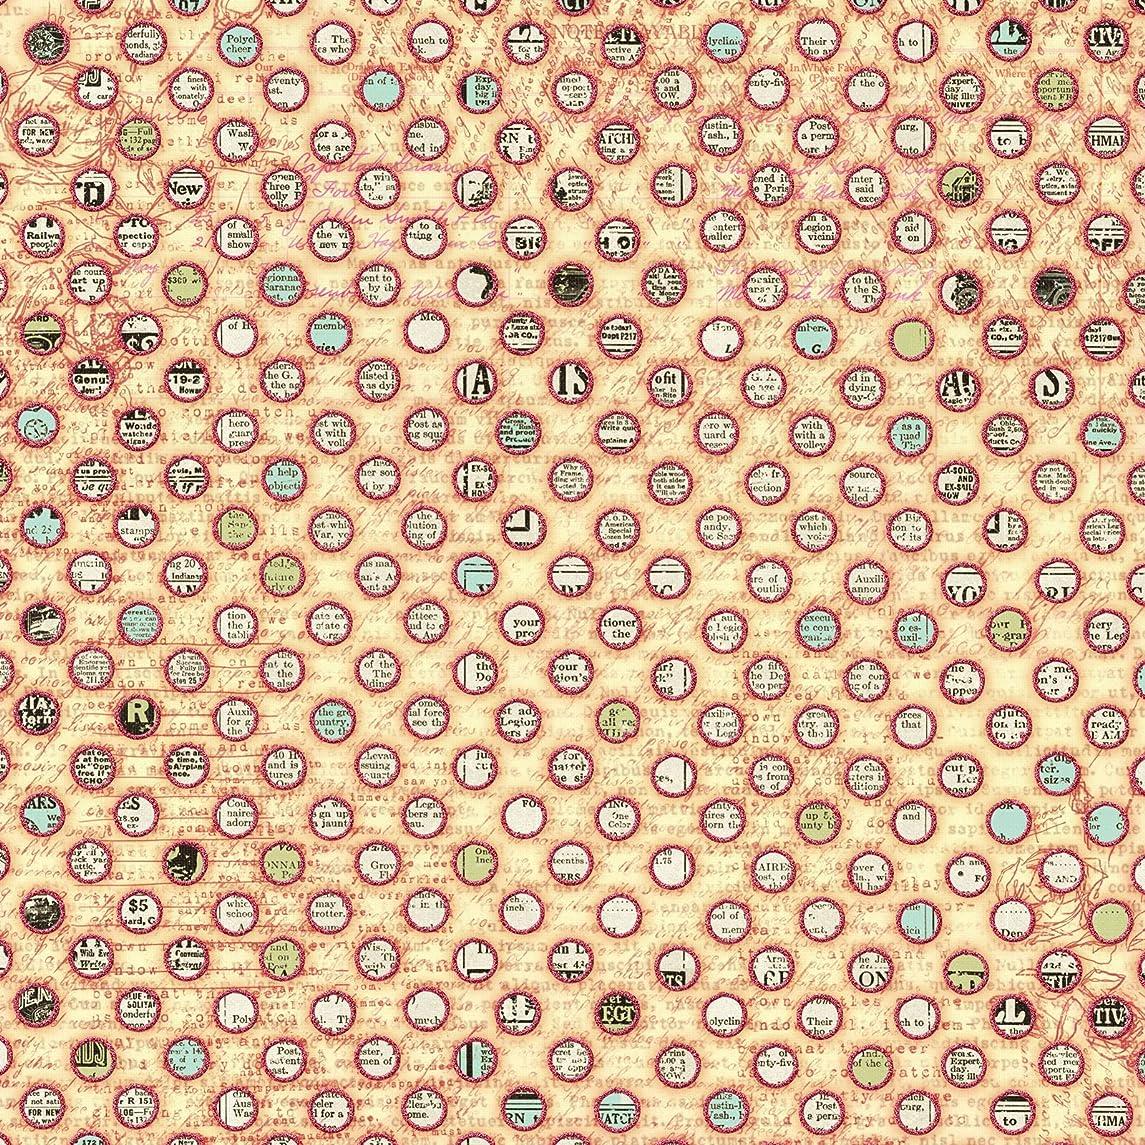 Prima 812768 12 by 12-Inch Flirty Little Secrets Patterned Cardstock Paper, Ringlets, 25-Pack